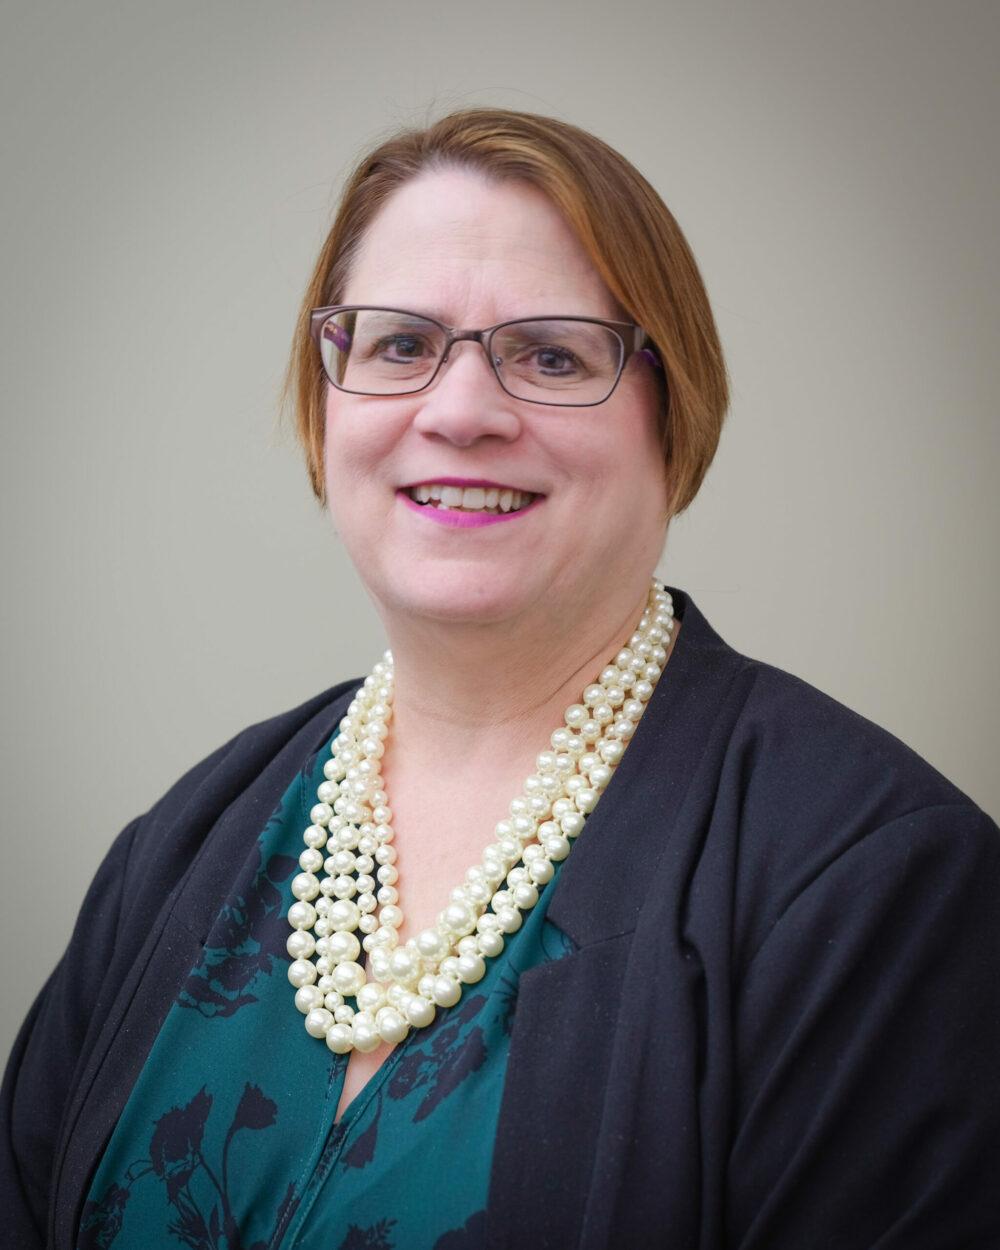 Karen Halaco